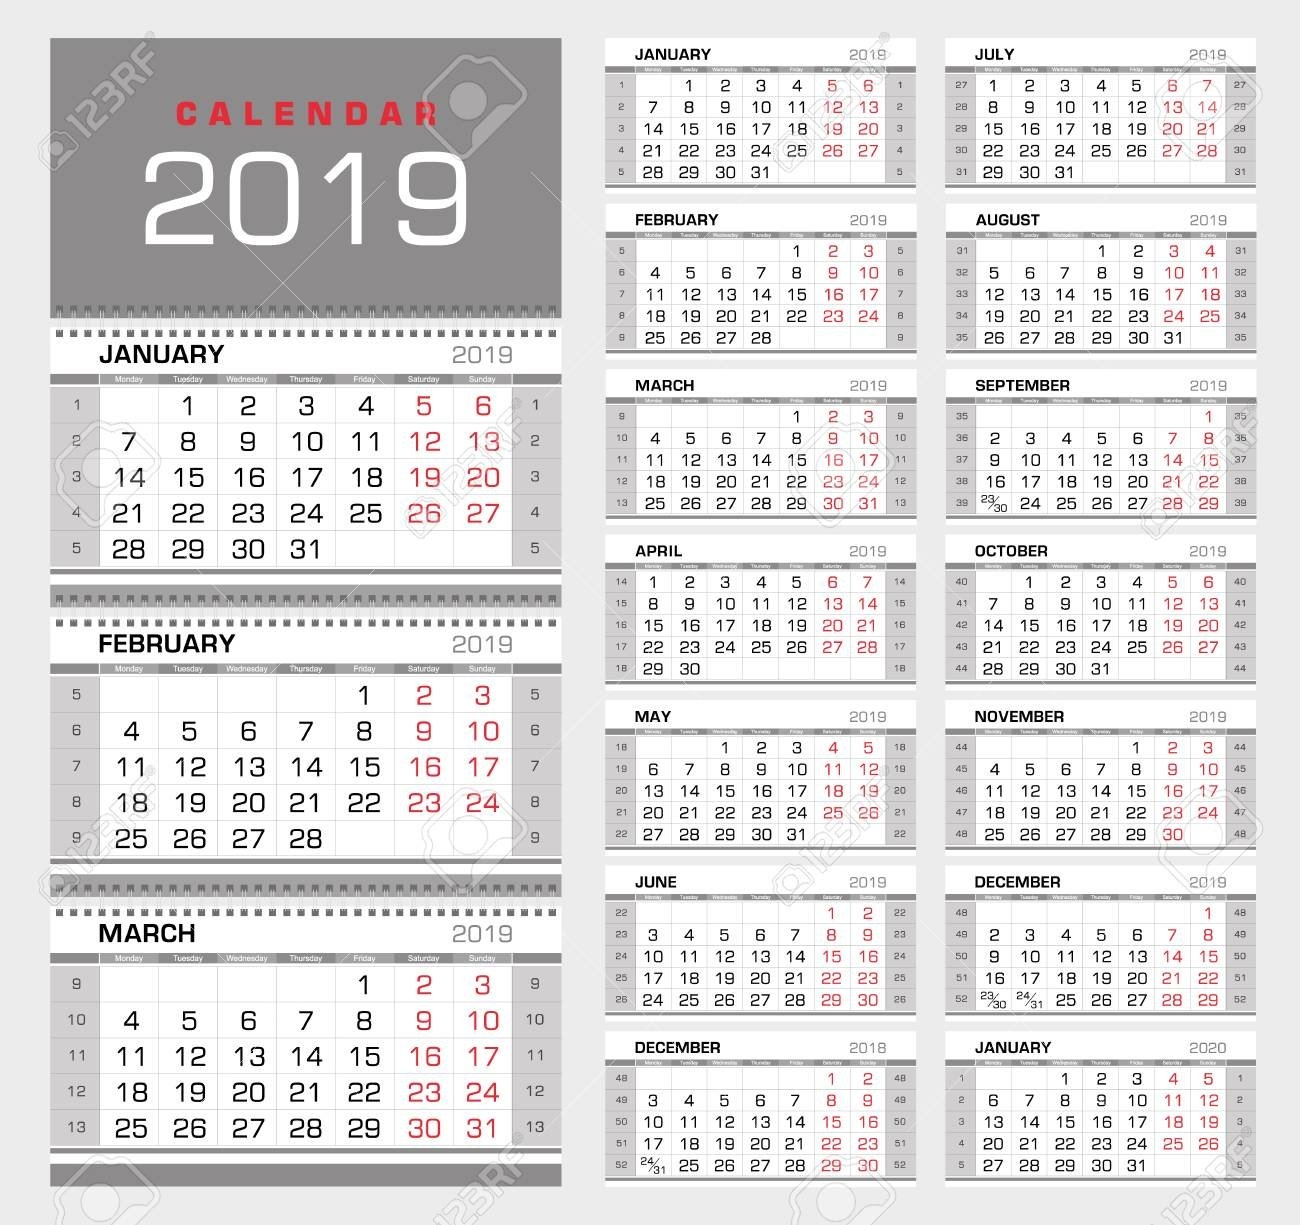 Wall Quarterly Calendar 2019 With Week Numbers. Week Start From Calendar 2019 With Week Numbers